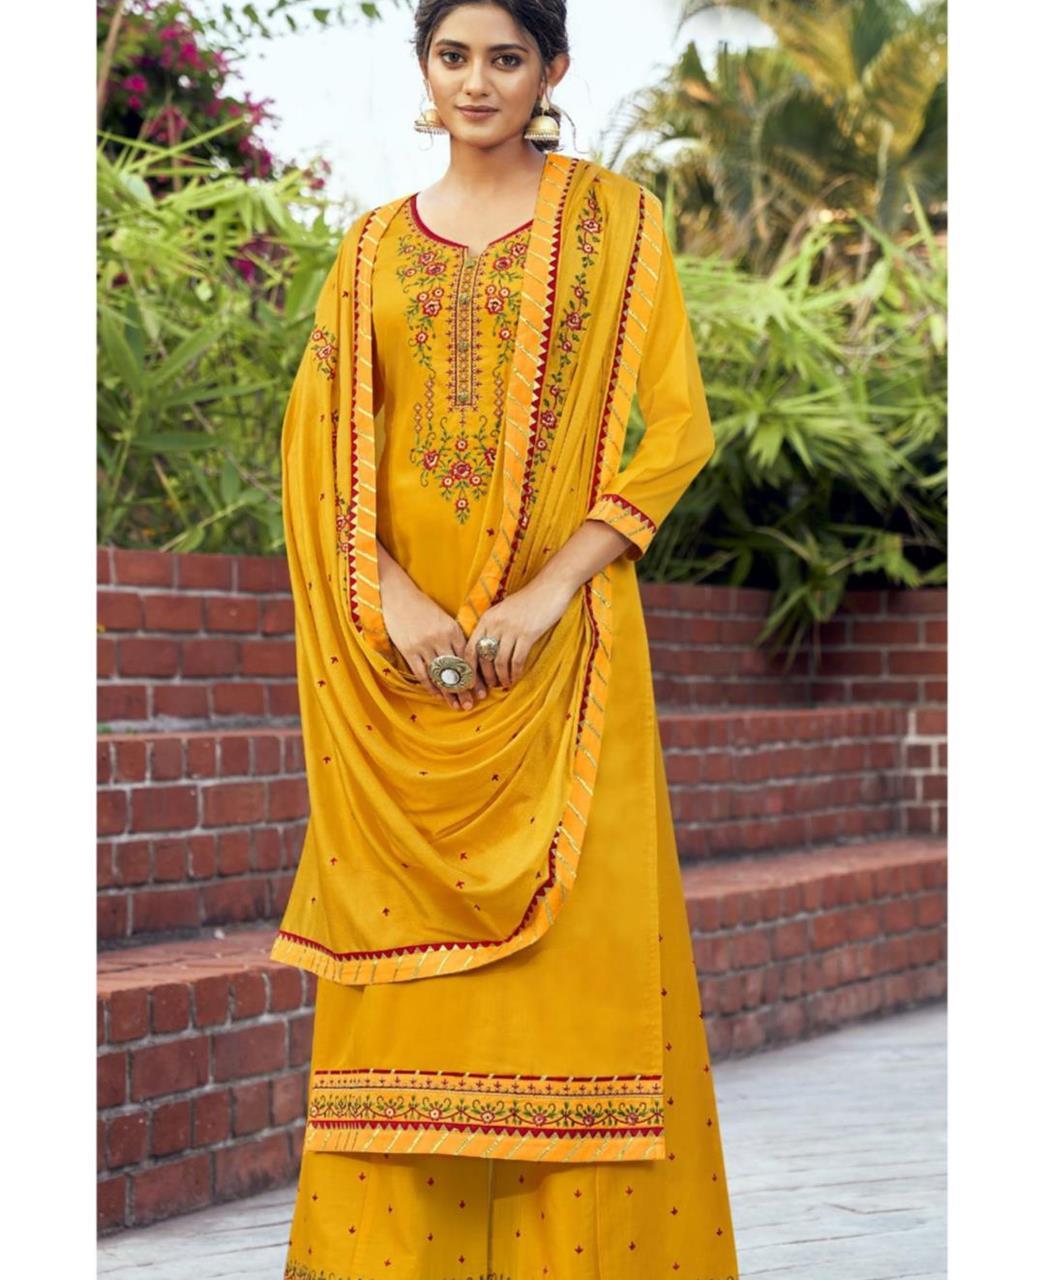 Embroidered Cotton Straight cut Salwar Kameez in Musterd